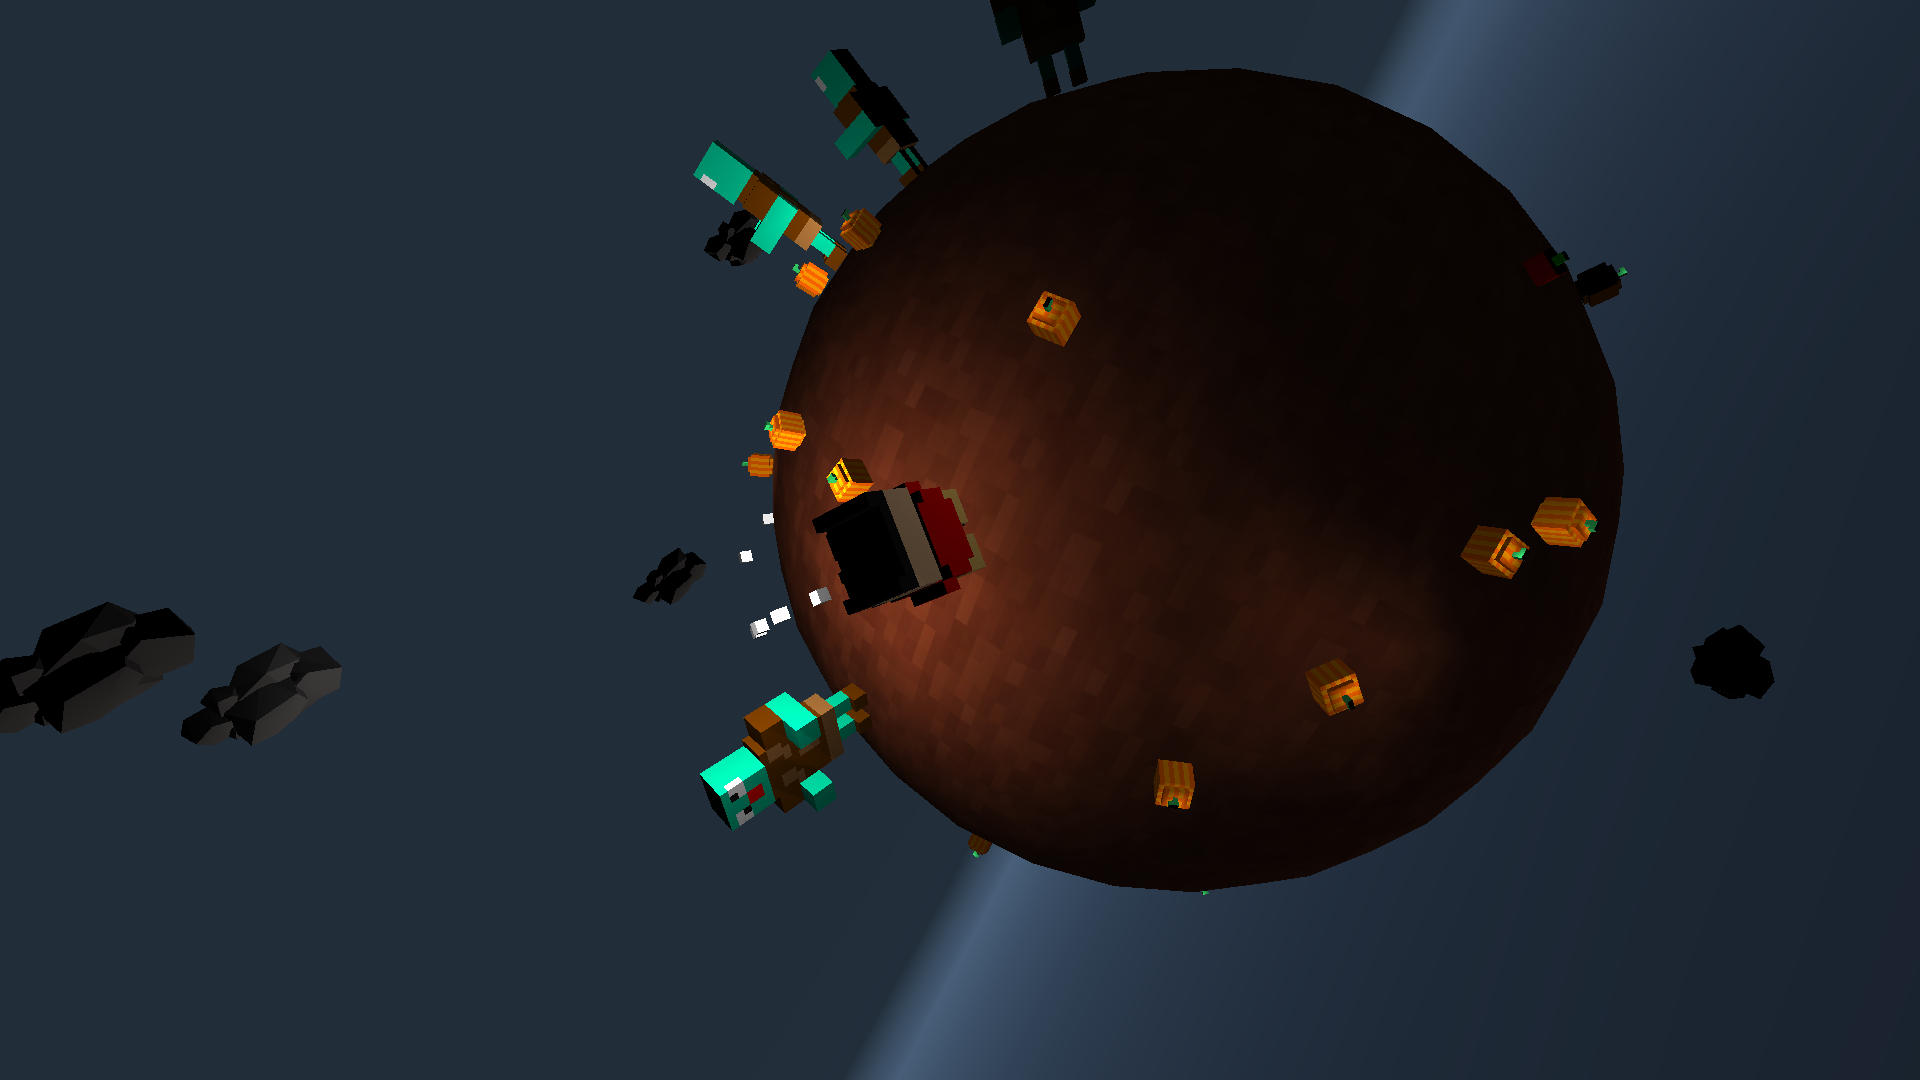 Screenshot 13 of 15